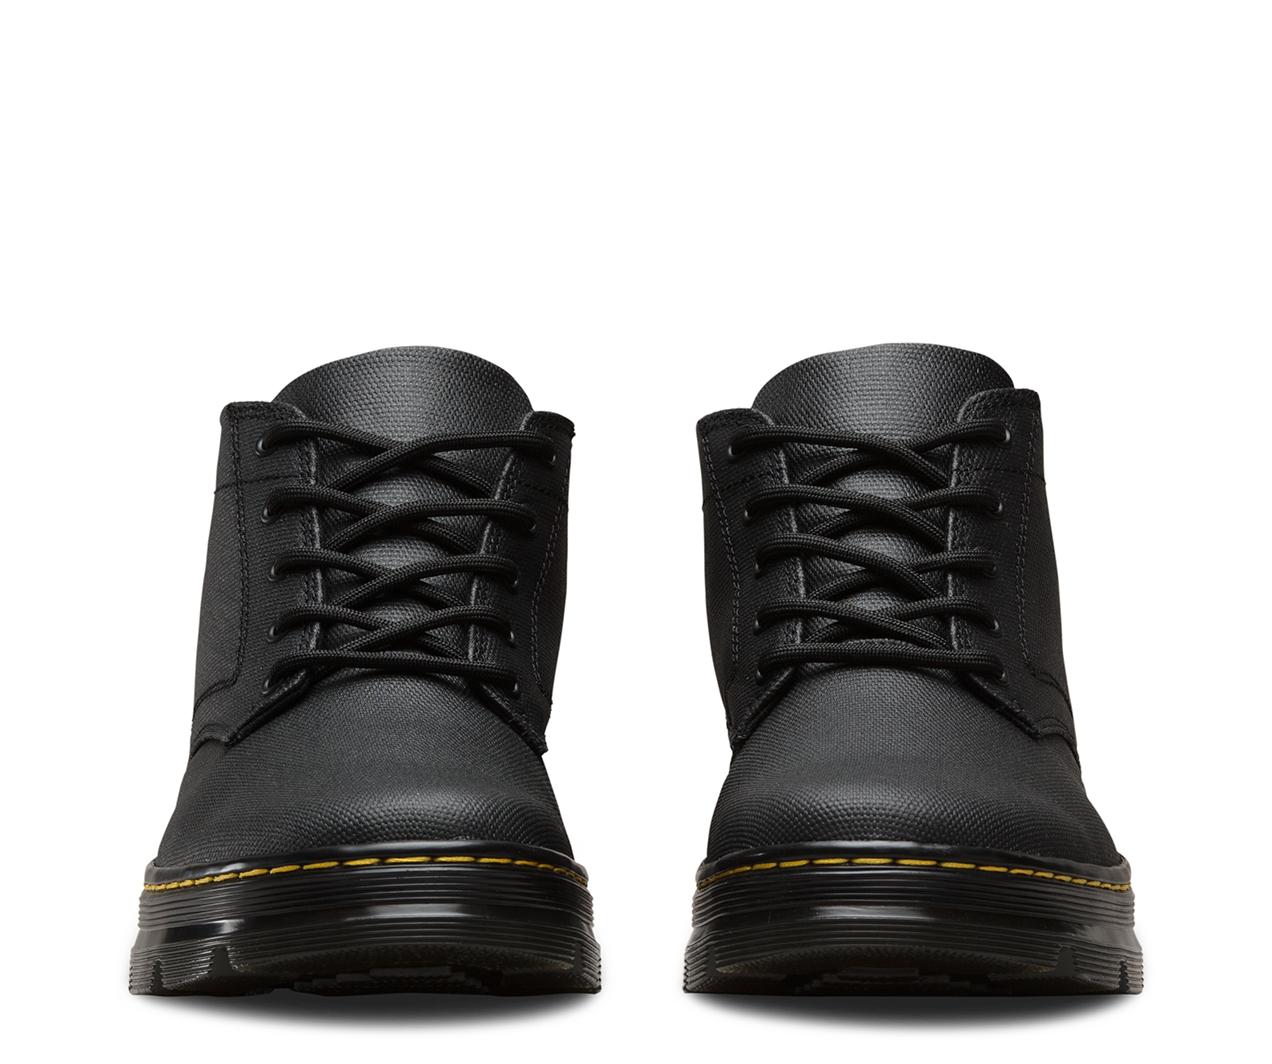 75f4d17acf9 BONNY WAXY COATED | Women's Boots & Shoes | Canada